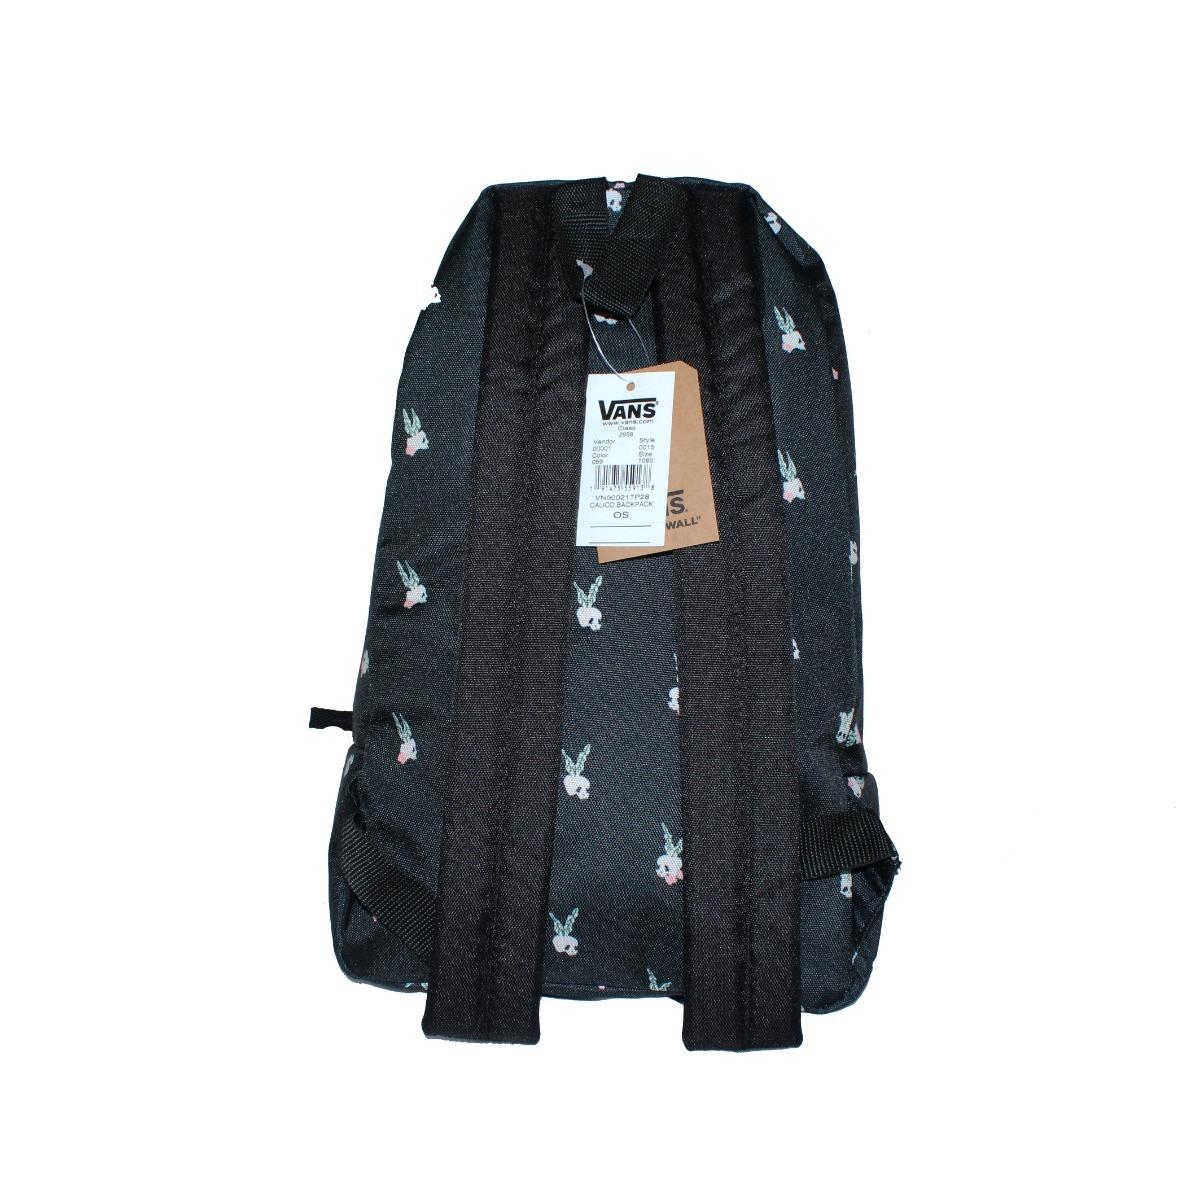 mochila vans calico negra calavera escolar juvenil remate. Cargando zoom. 8a409410201